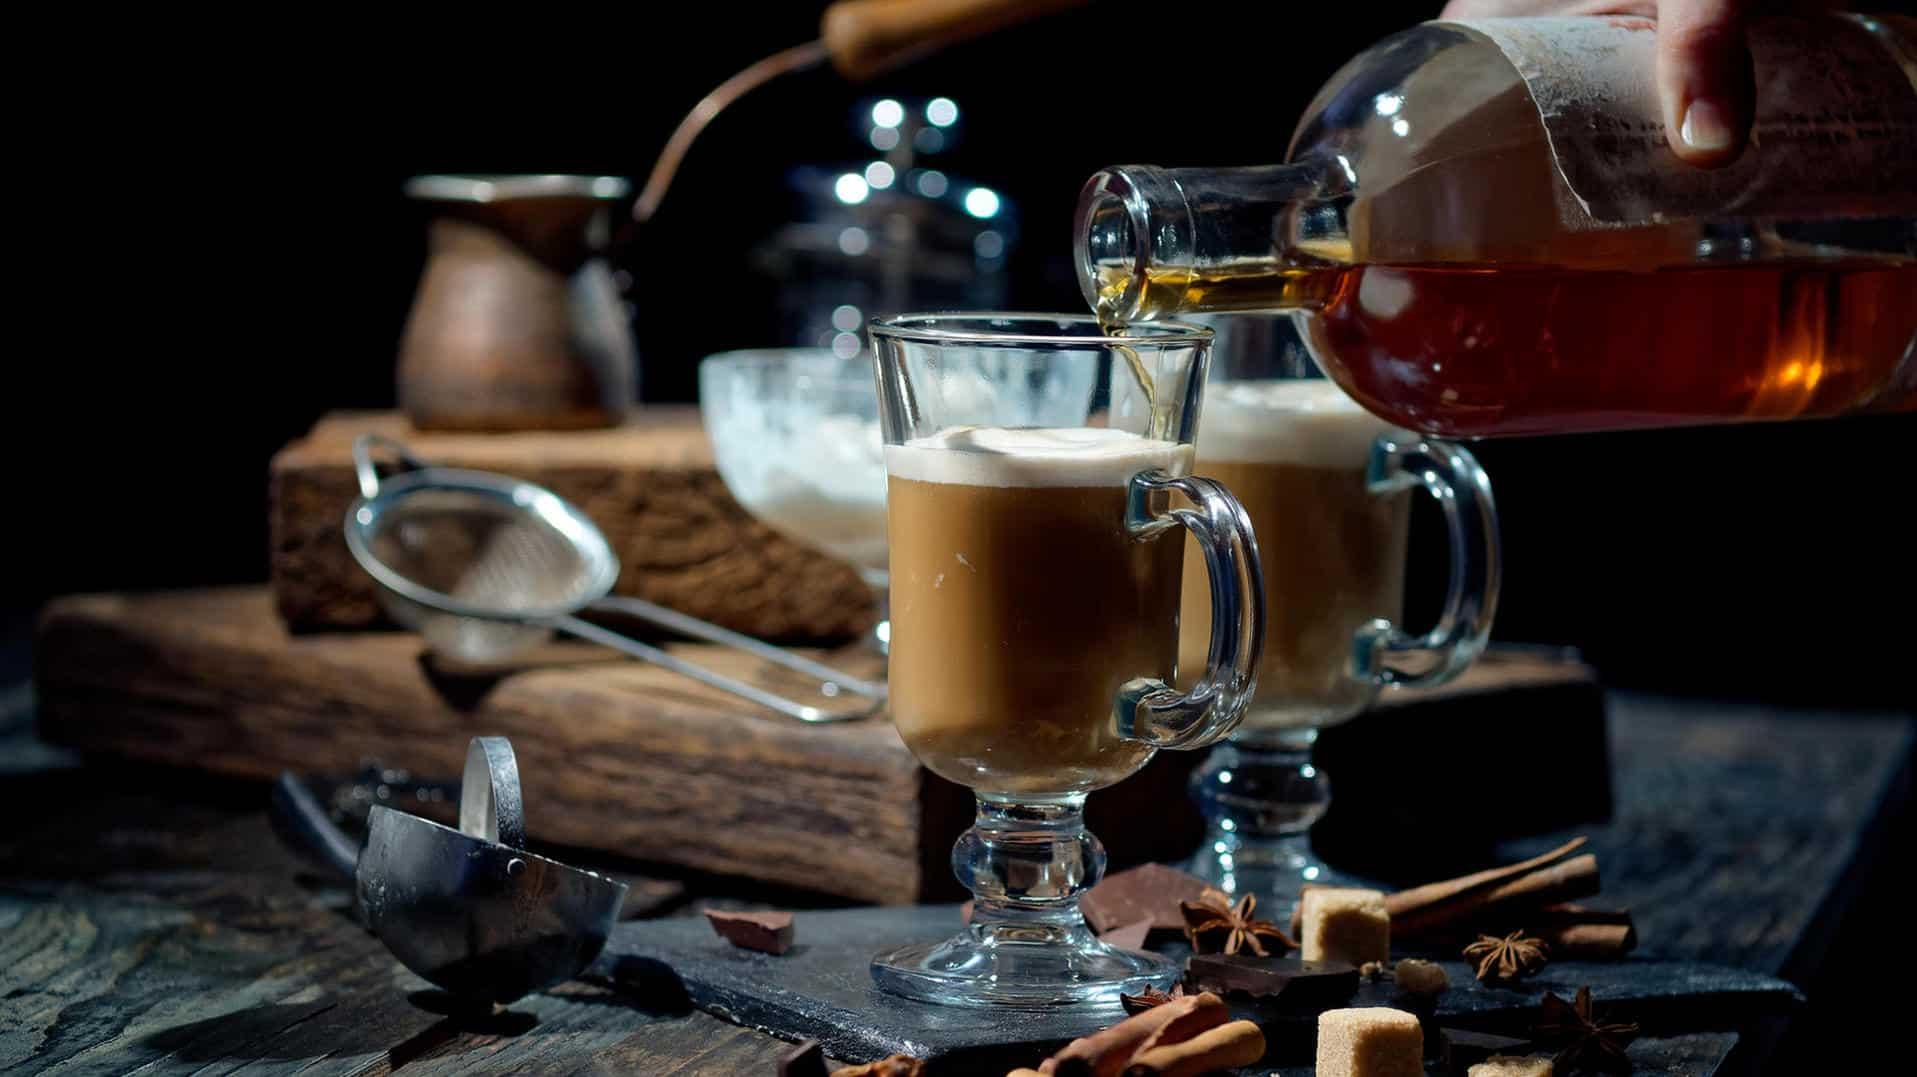 Kaffeeidee Nr. 2 Kaffee mit Alkohol